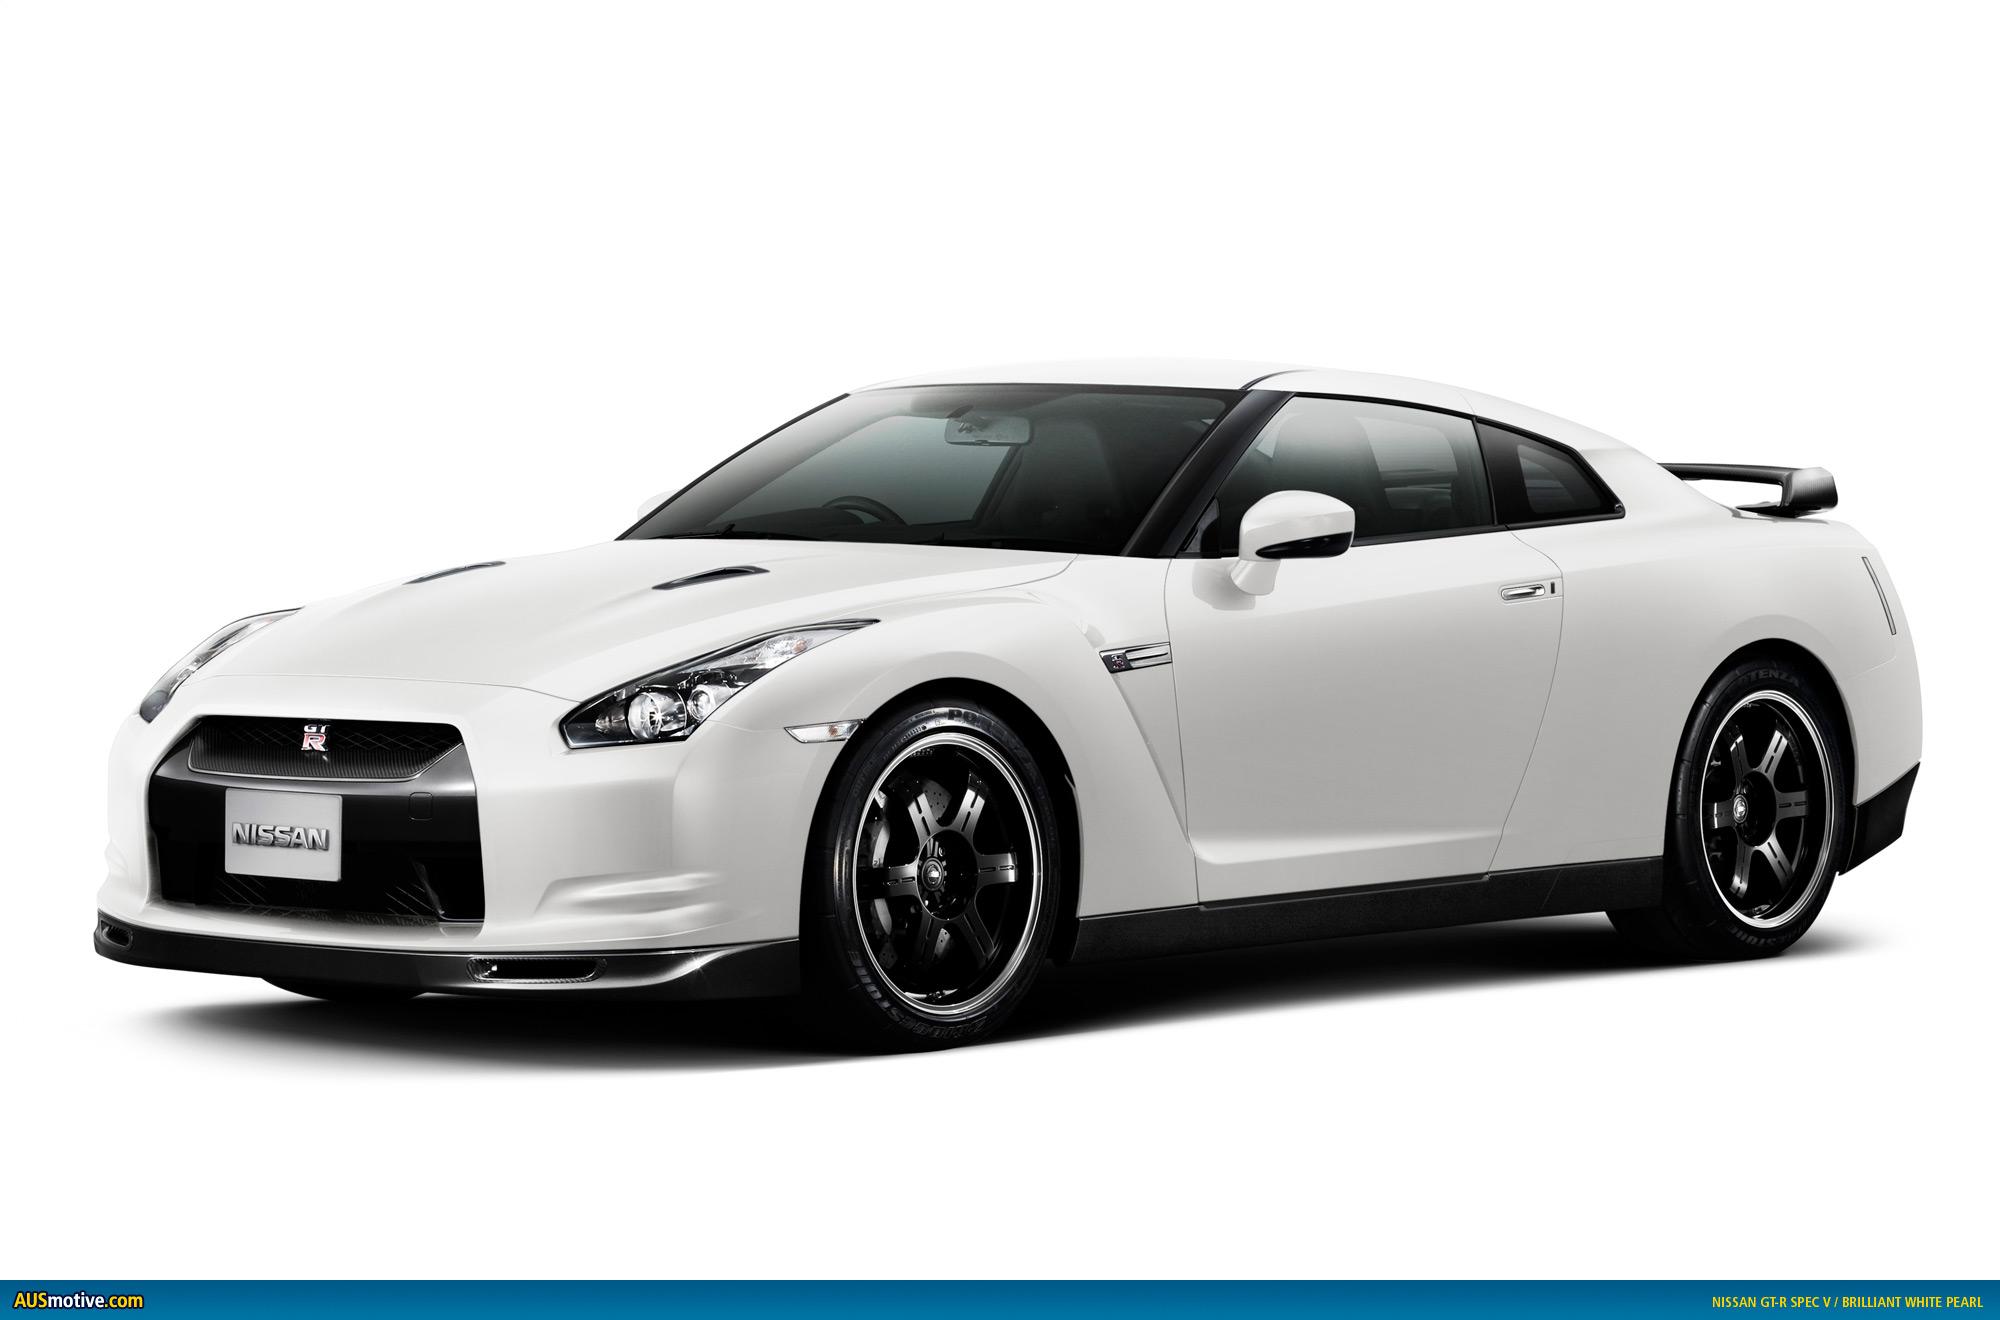 AUSmotive Nissan GT R Spec V details announced